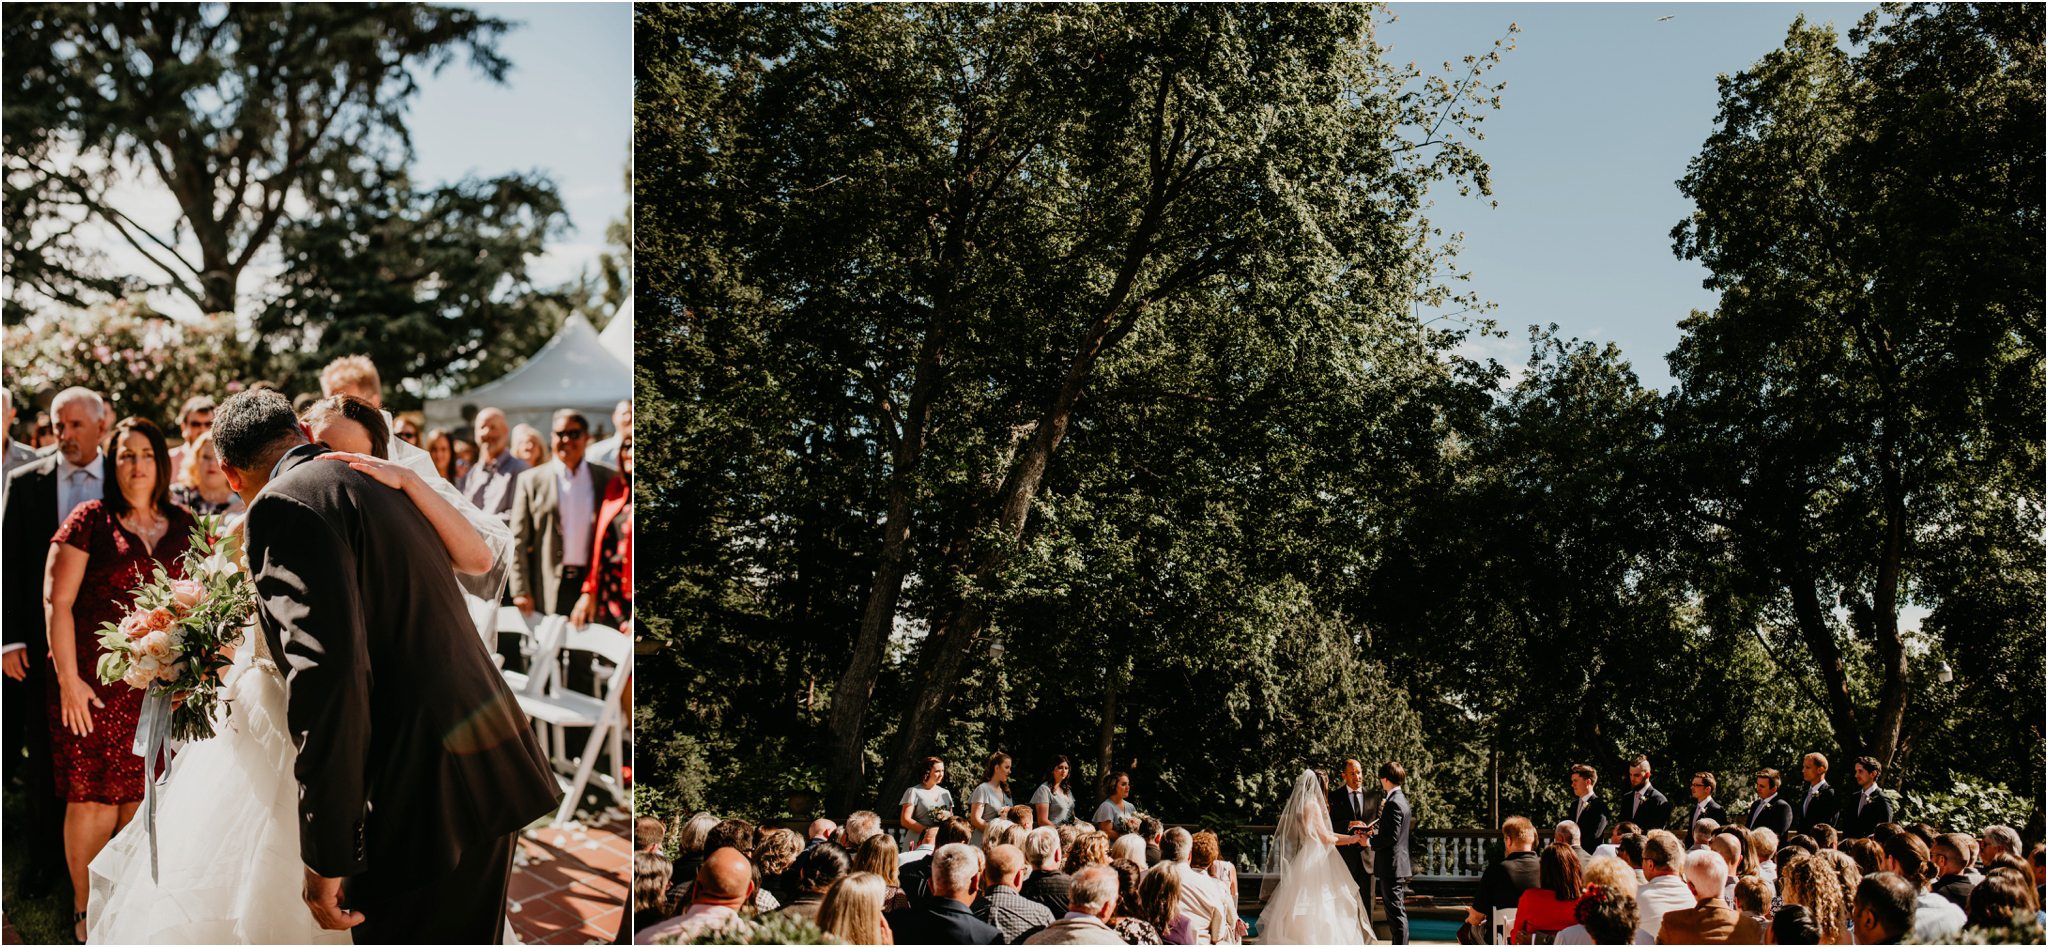 chance-and-ondrea-lairmont-manor-wedding-seattle-photographer-079.jpg